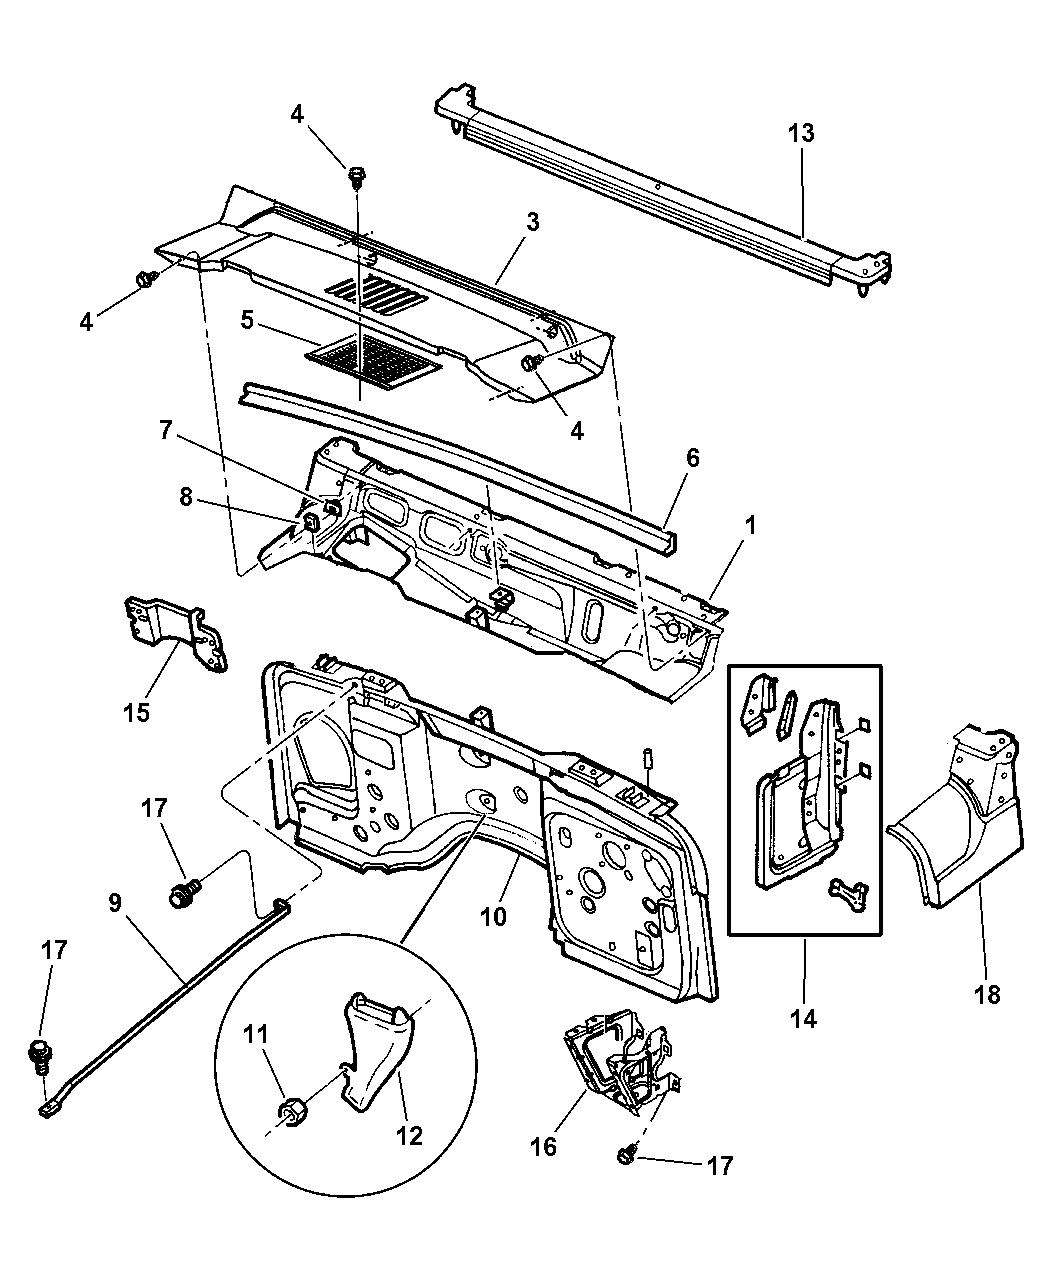 55176092 - genuine mopar cowl panel-cowl side 2002 jeep wrangler engine diagram oil 2002 jeep wrangler dash diagram